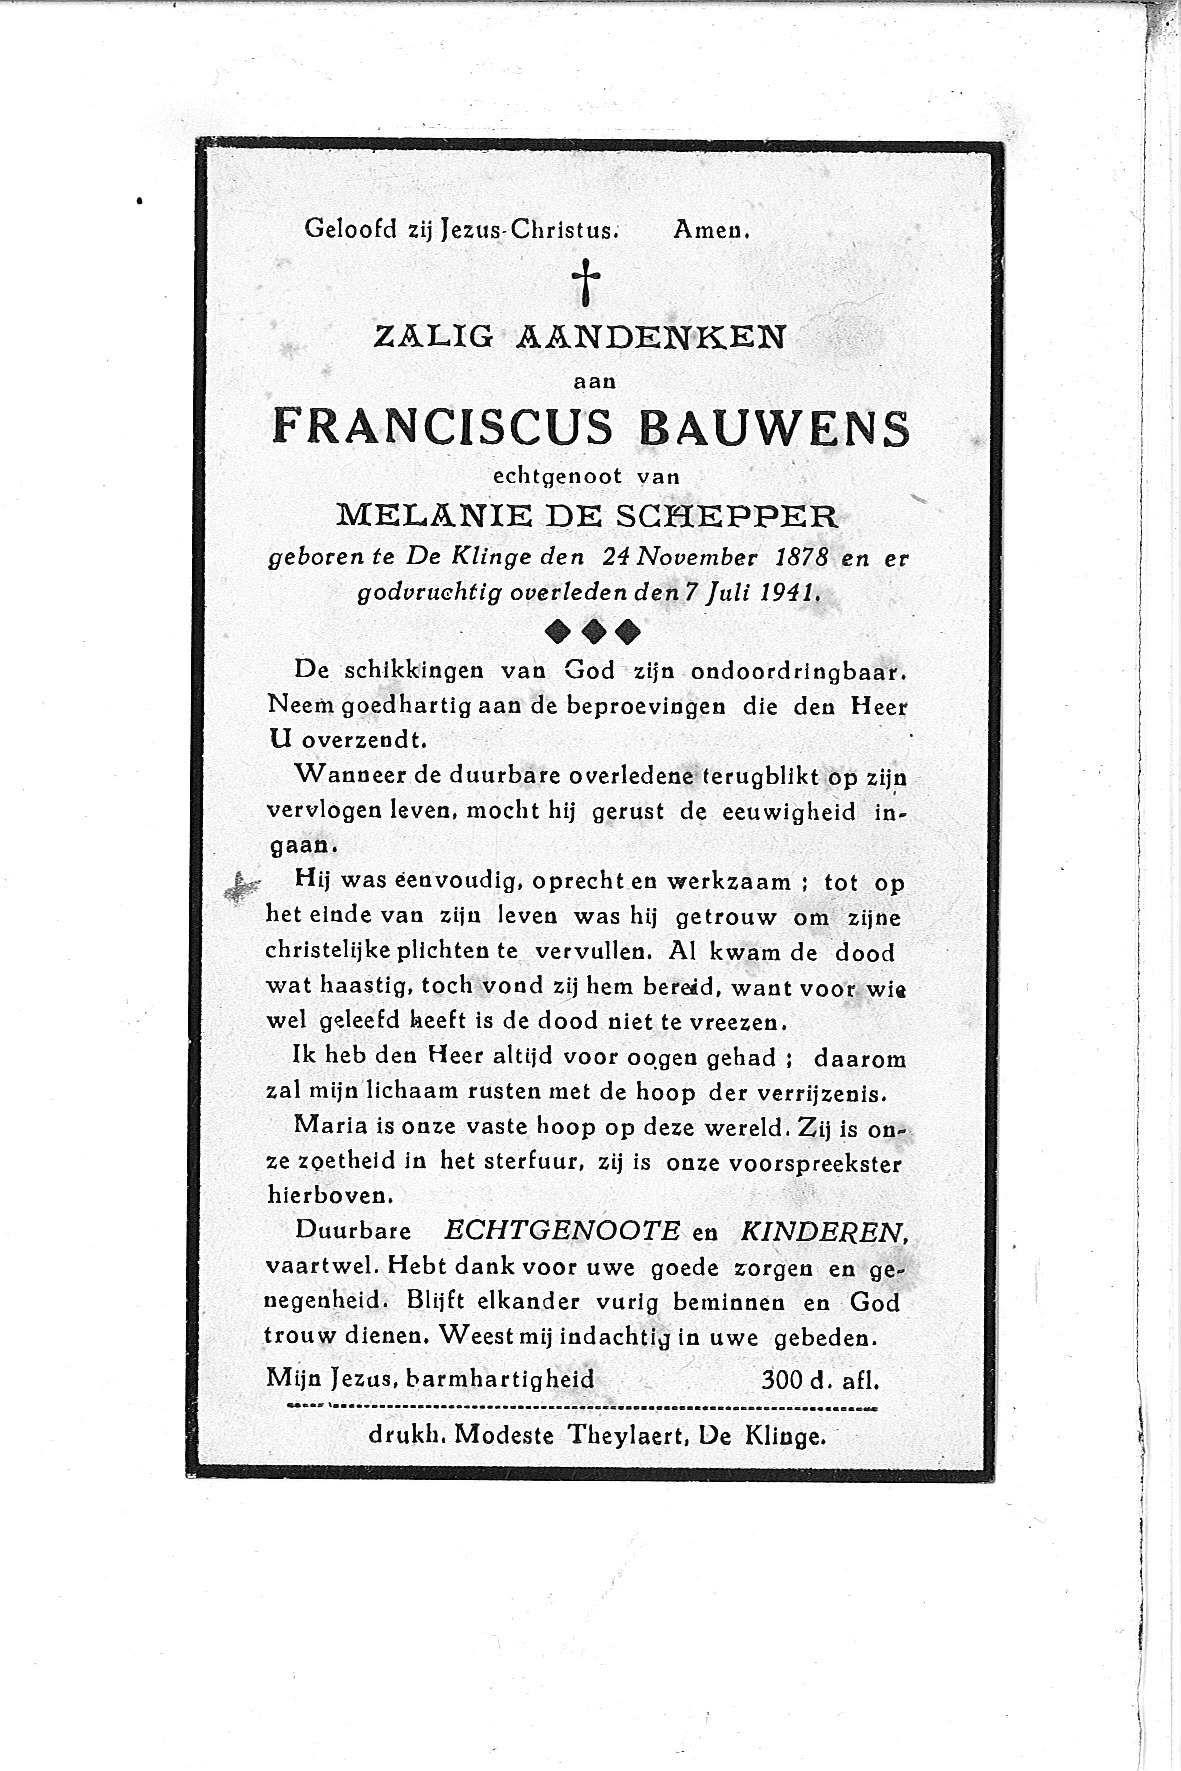 Franciscus(1941)20101026135255_00025.jpg